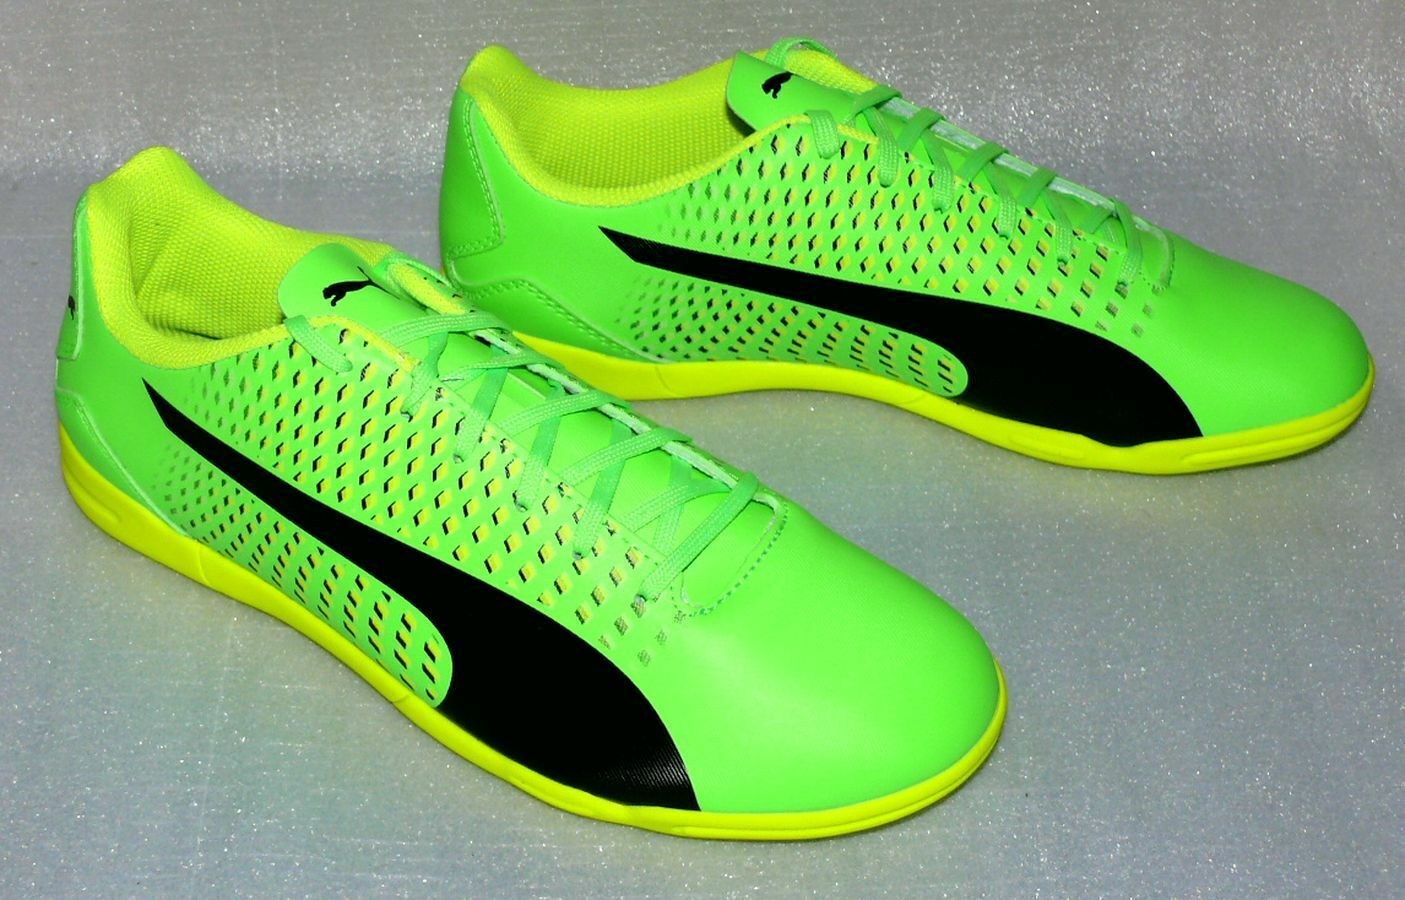 Puma Bdreno 3 IT 10404701 Herren Schuhe Fußball Sneaker EU 40,5 Neon Grün Gelb